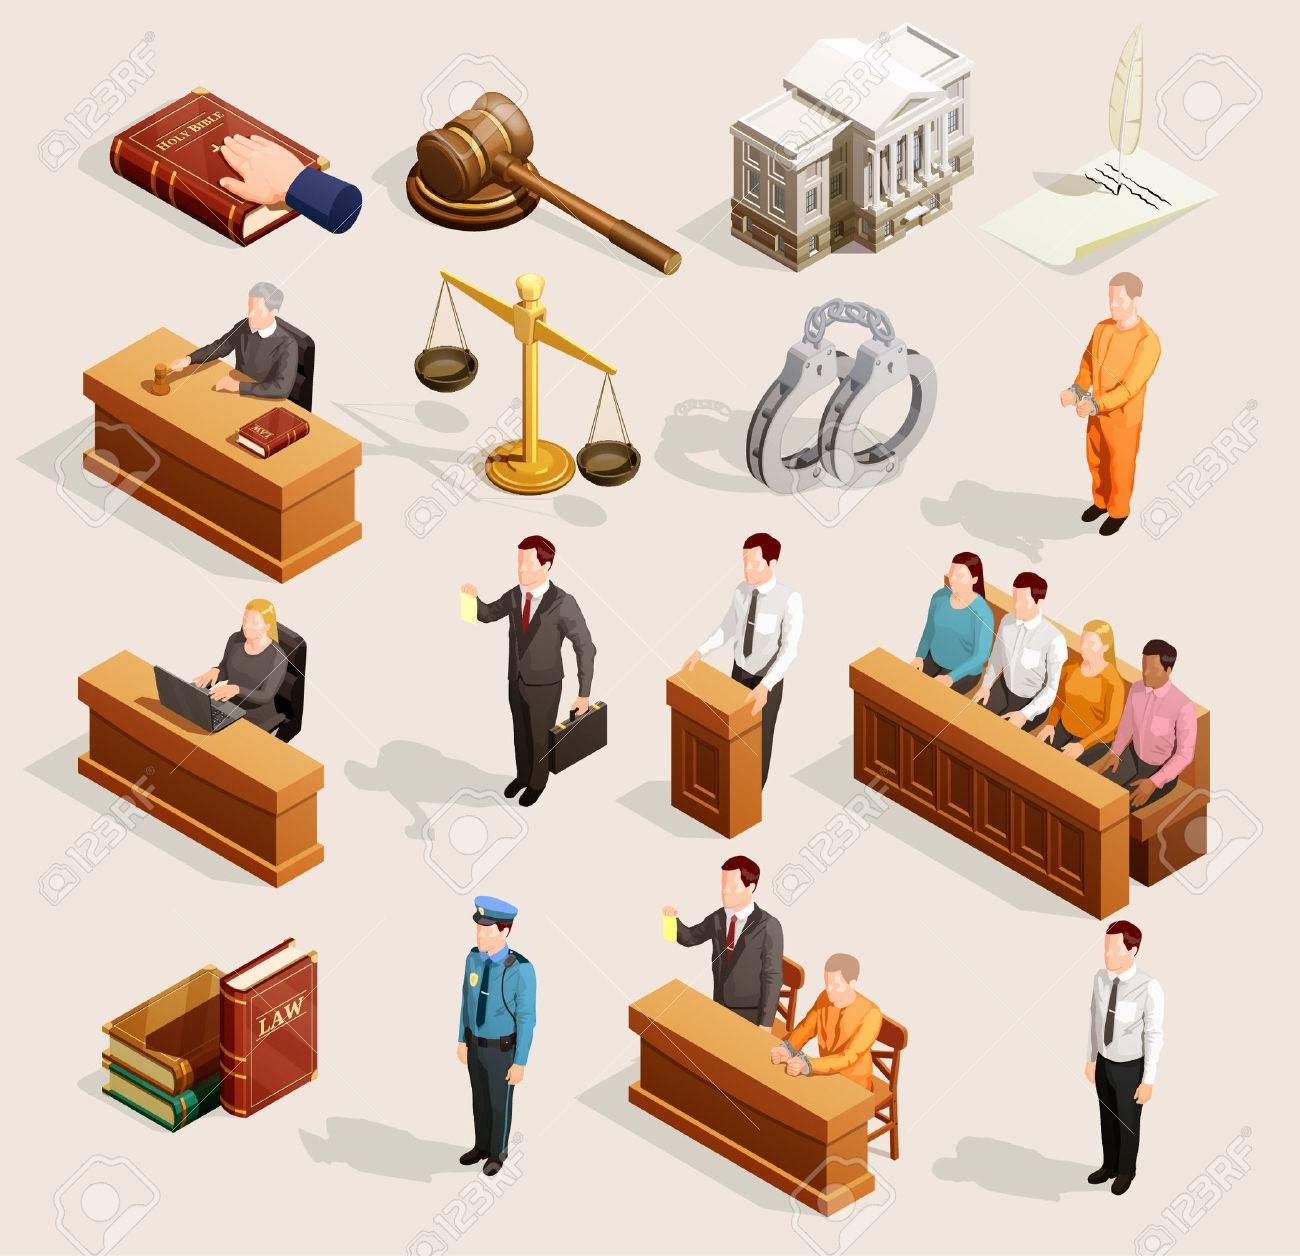 Law icon isometric set of isolated public justice symbols balance gavel wristbands judge and jury characters vector illustration. - 83336647